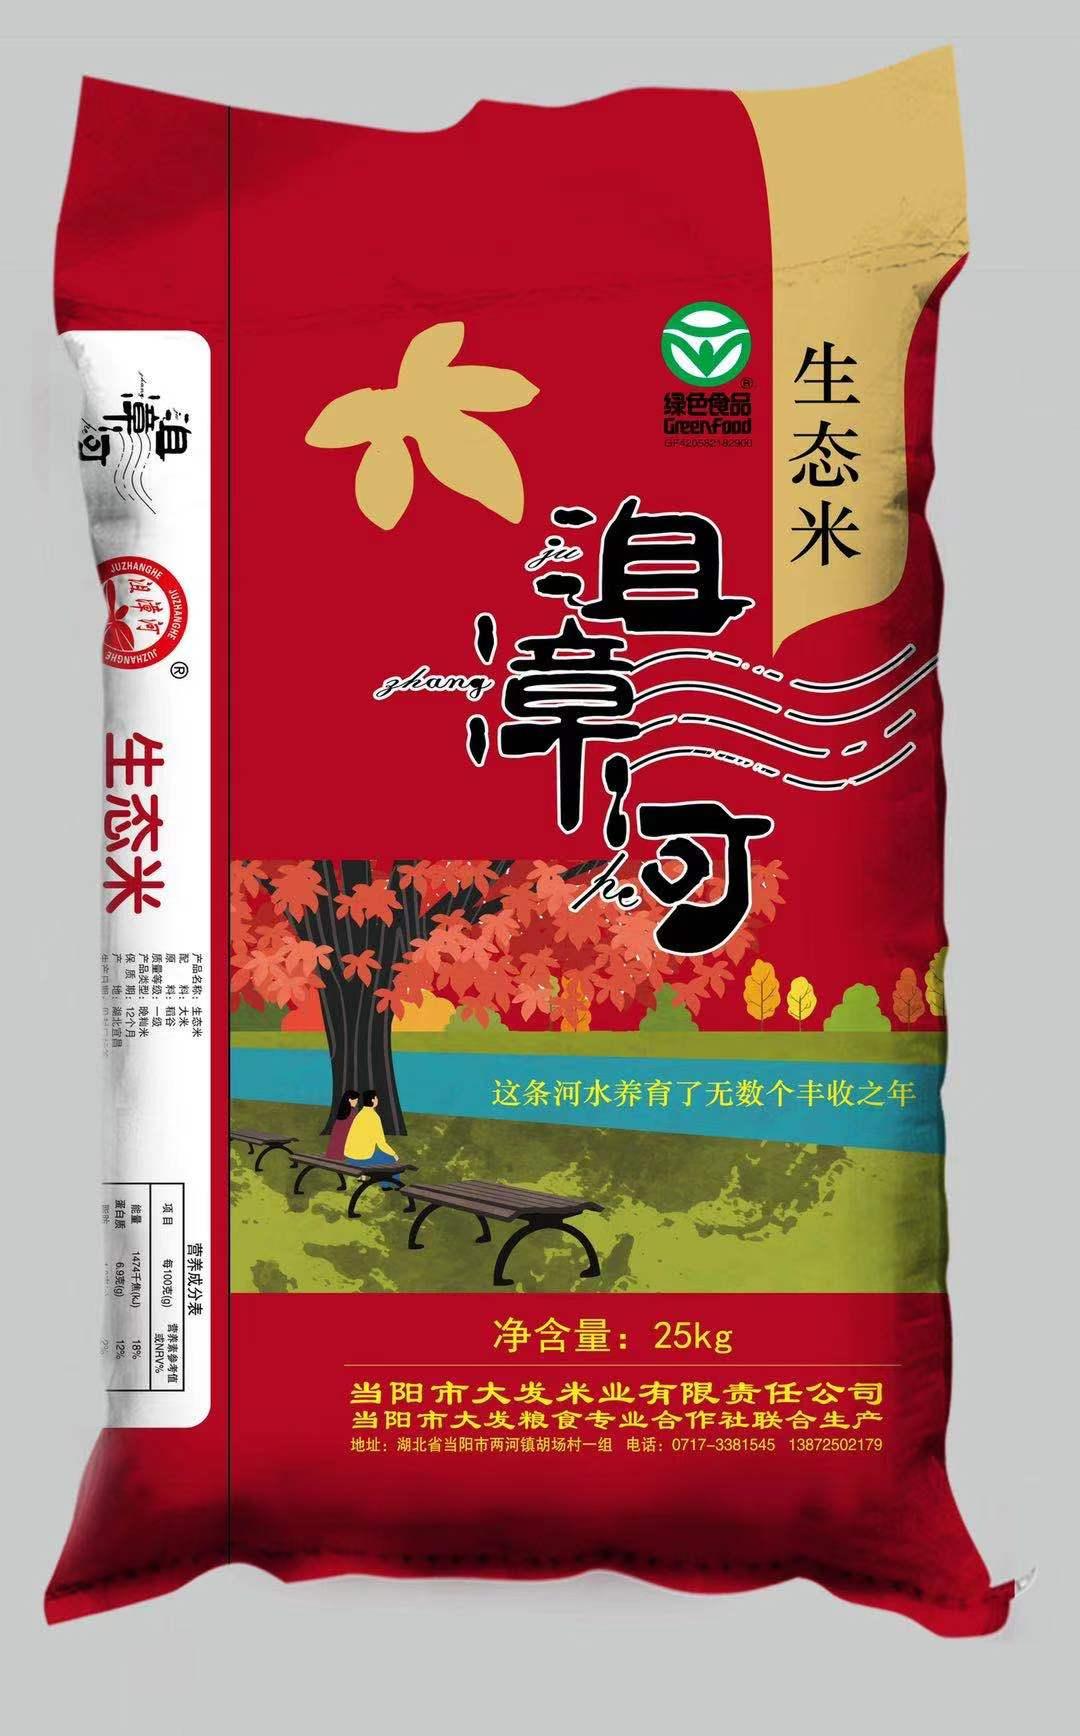 25kg沮漳河生态米